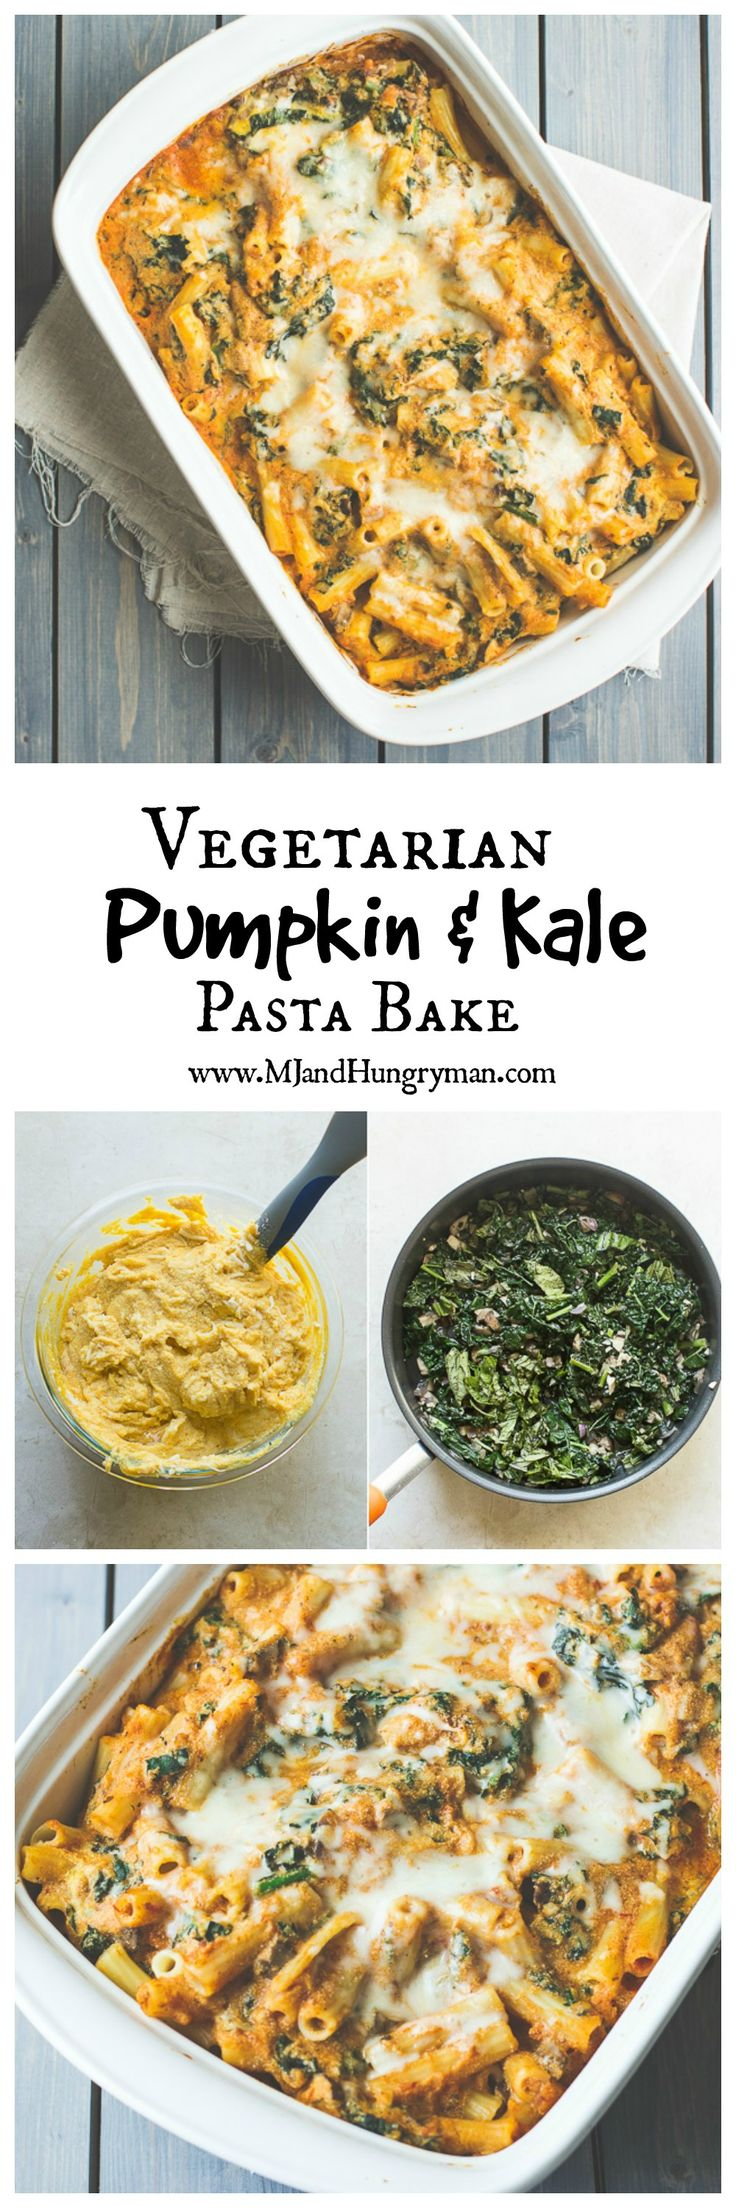 Vegetarian pumpkin and kale pasta bake  **Omitted the mushrooms, added hot Italian sausage, and used vodka sauce instead of marinara